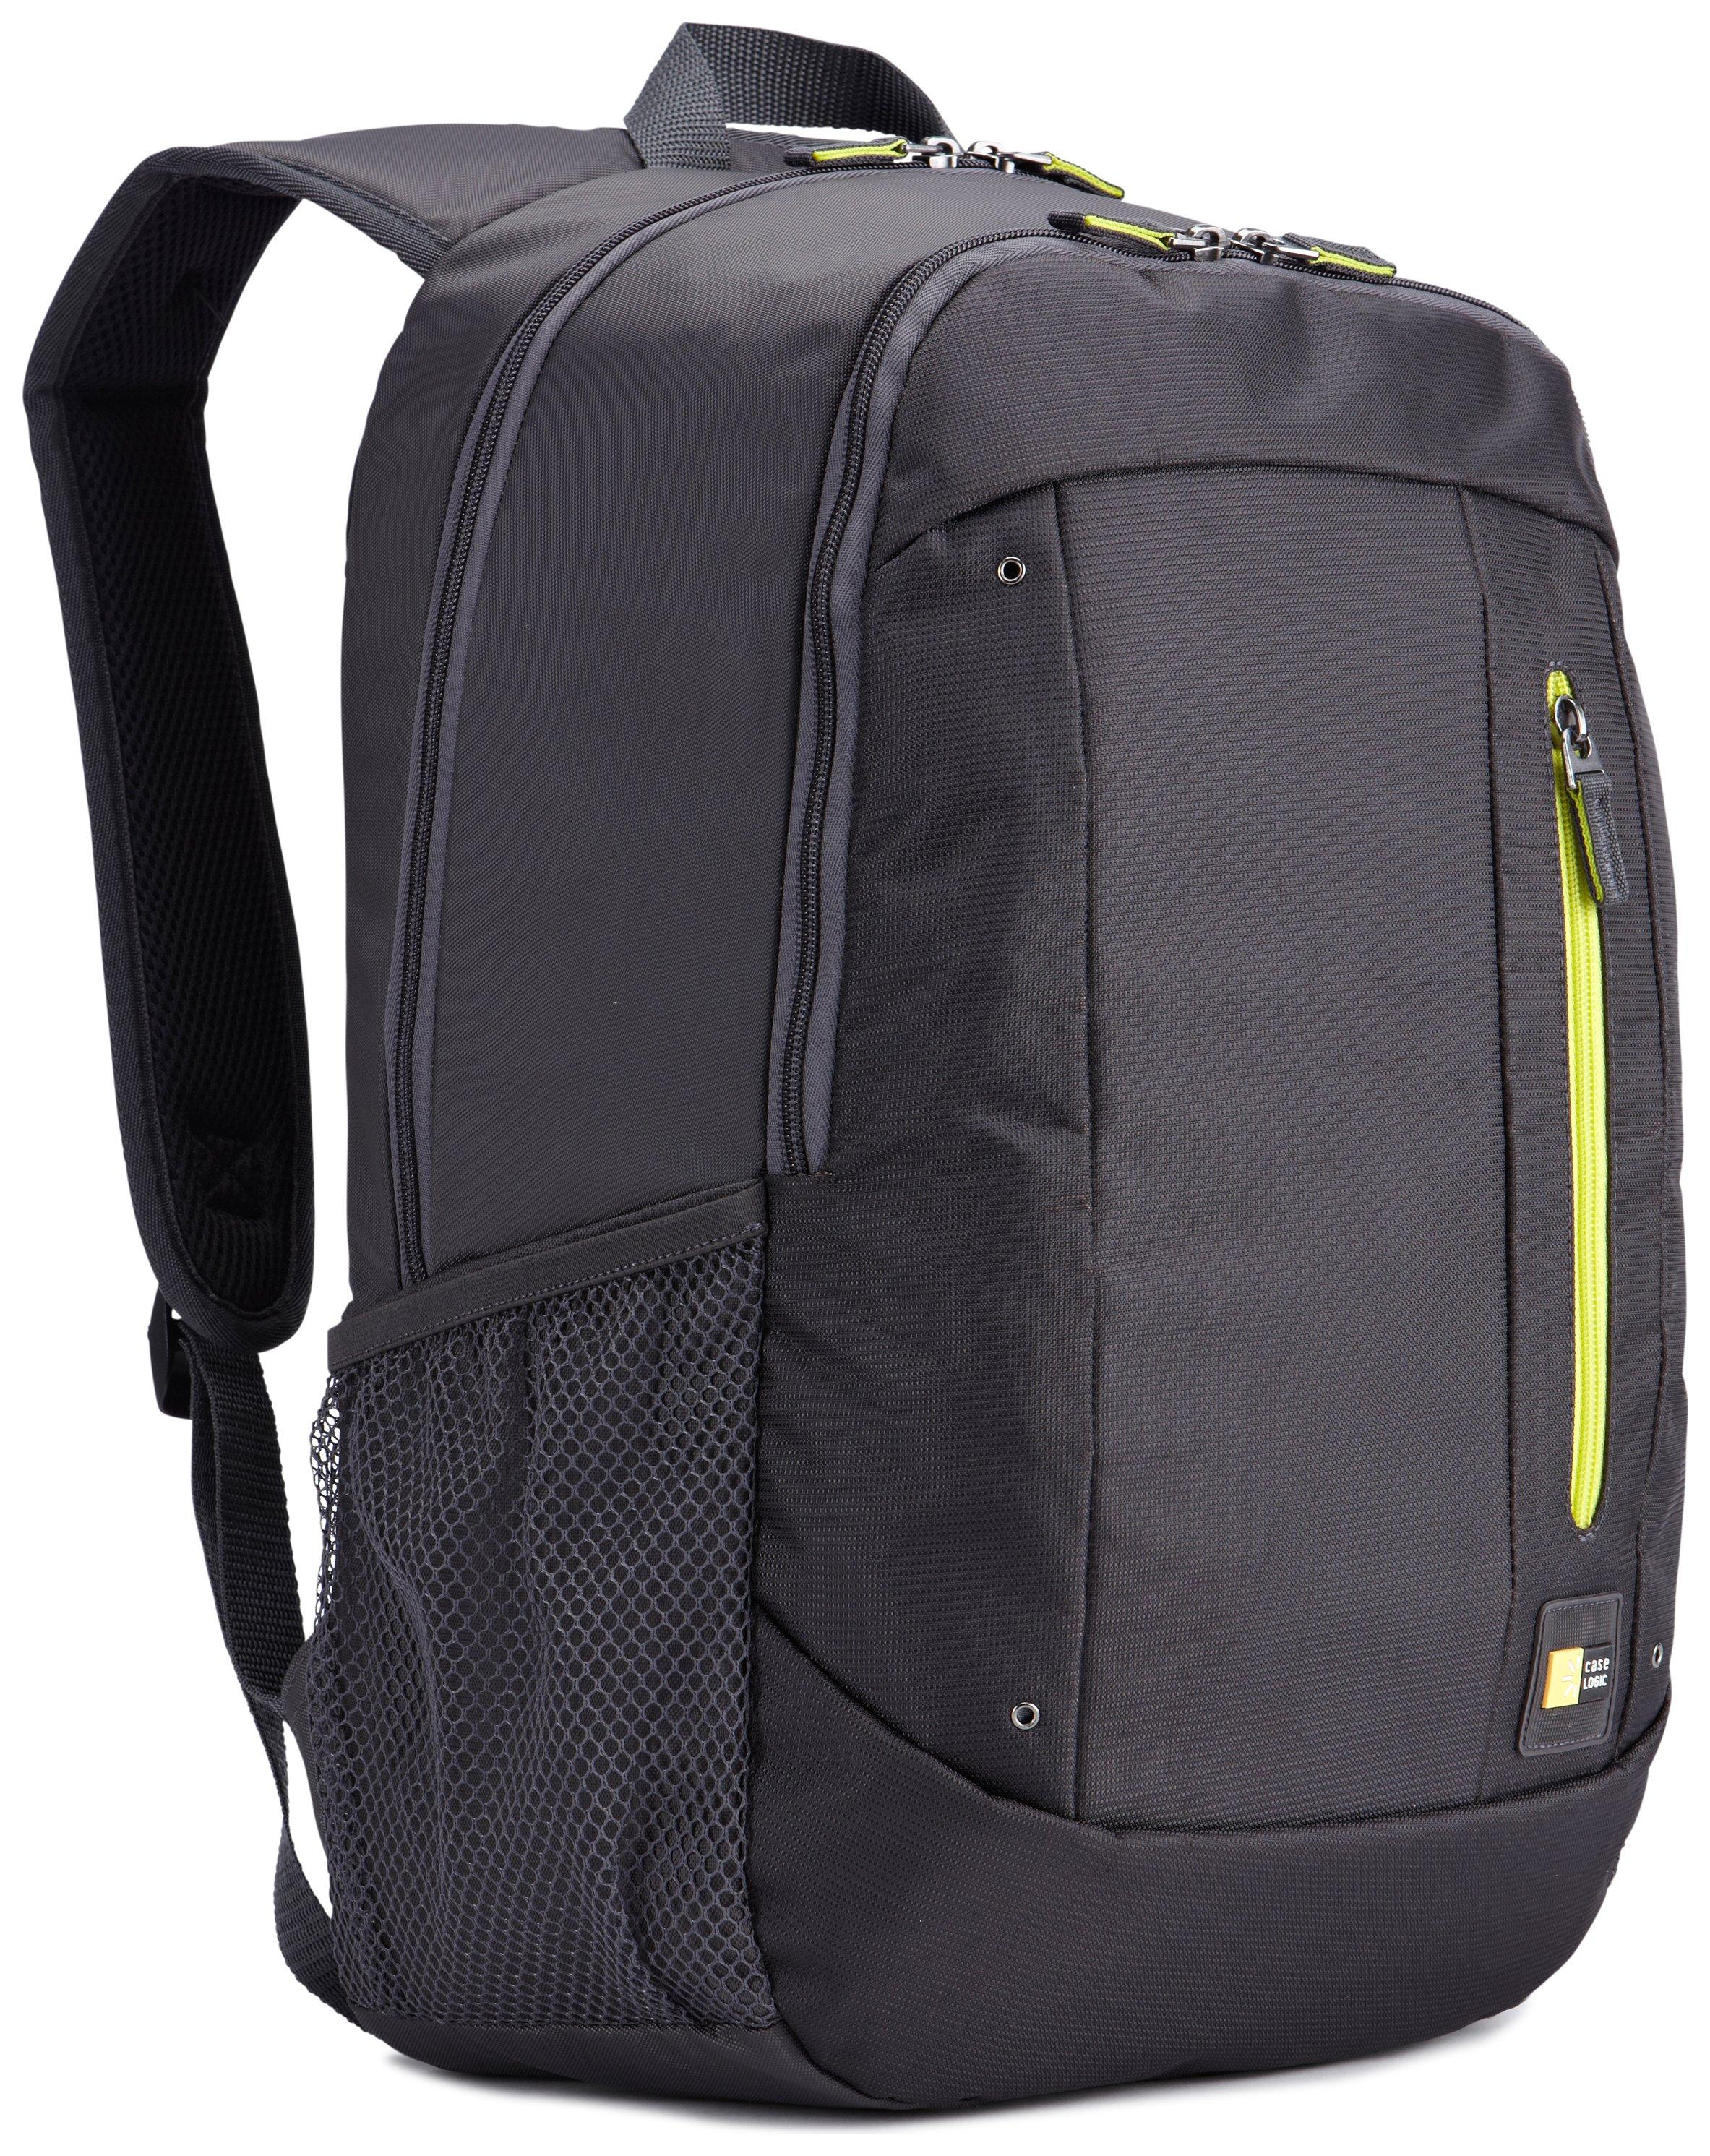 Image of Case Logic Jaunt 15.6 Inch Laptop Backpack - Anthracite.